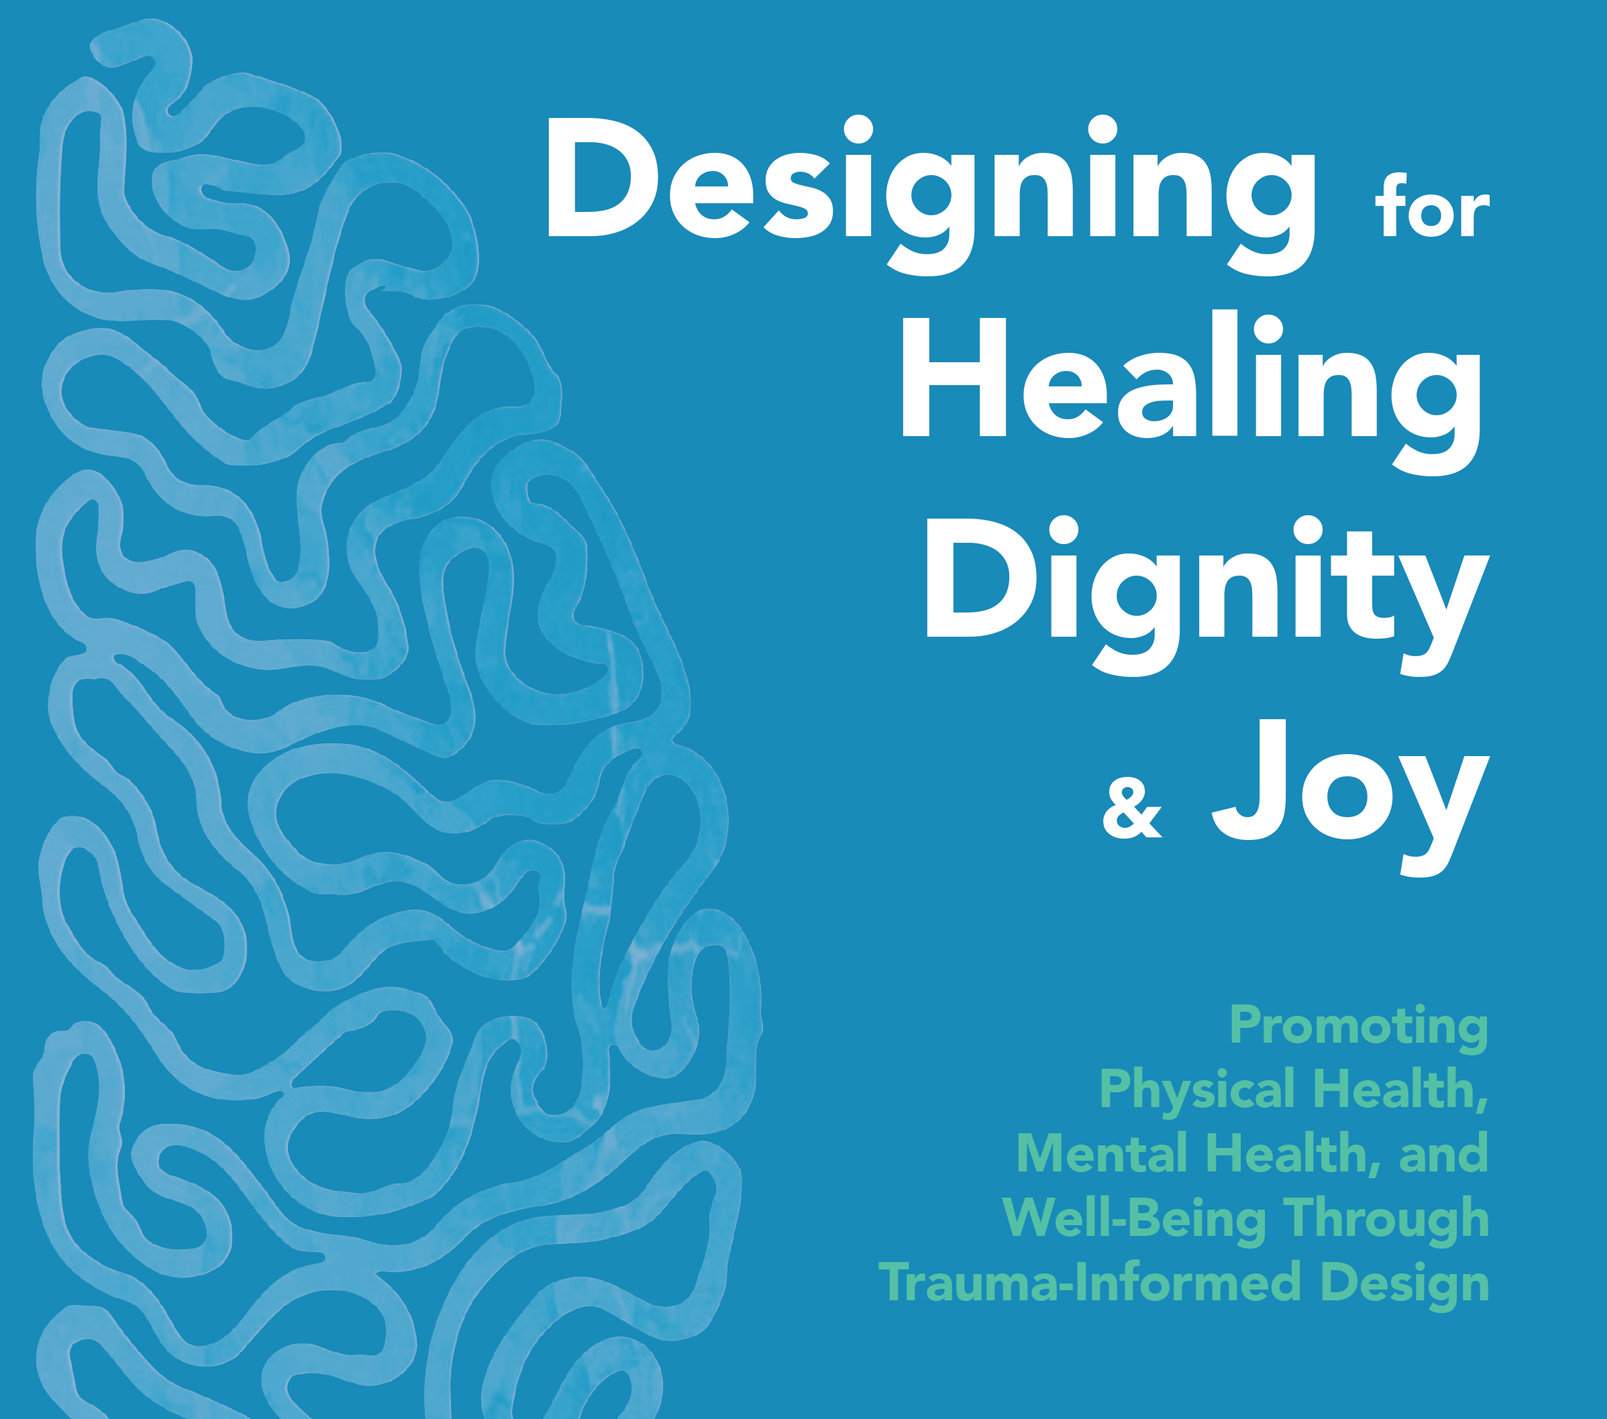 Designing for Healing Dignity & Joy